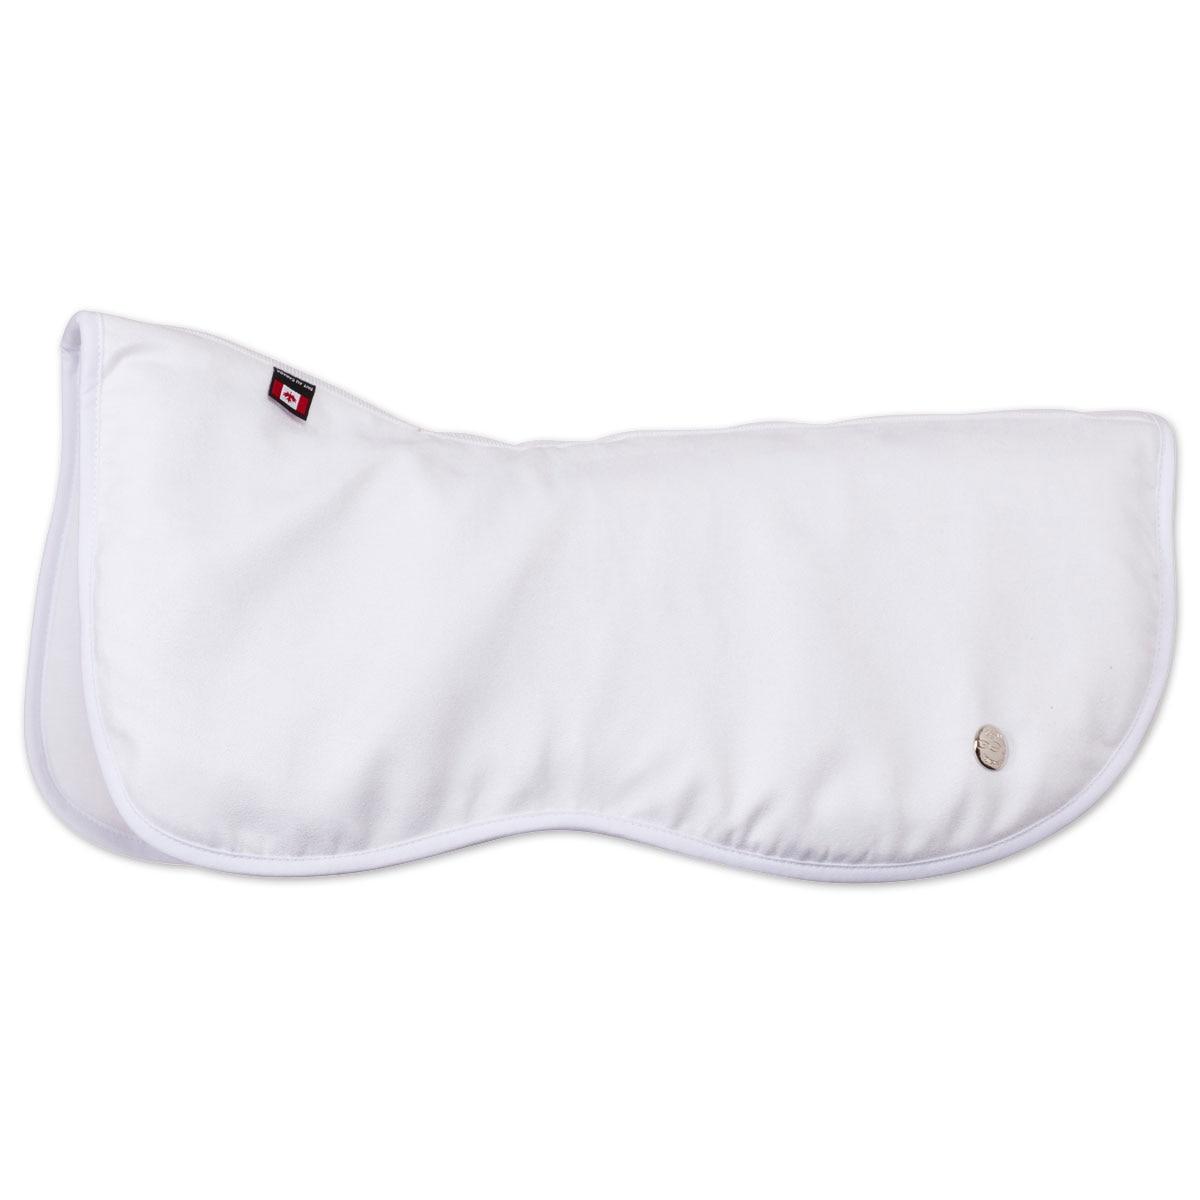 Ogilvy Dressage Memory Foam Half Pad